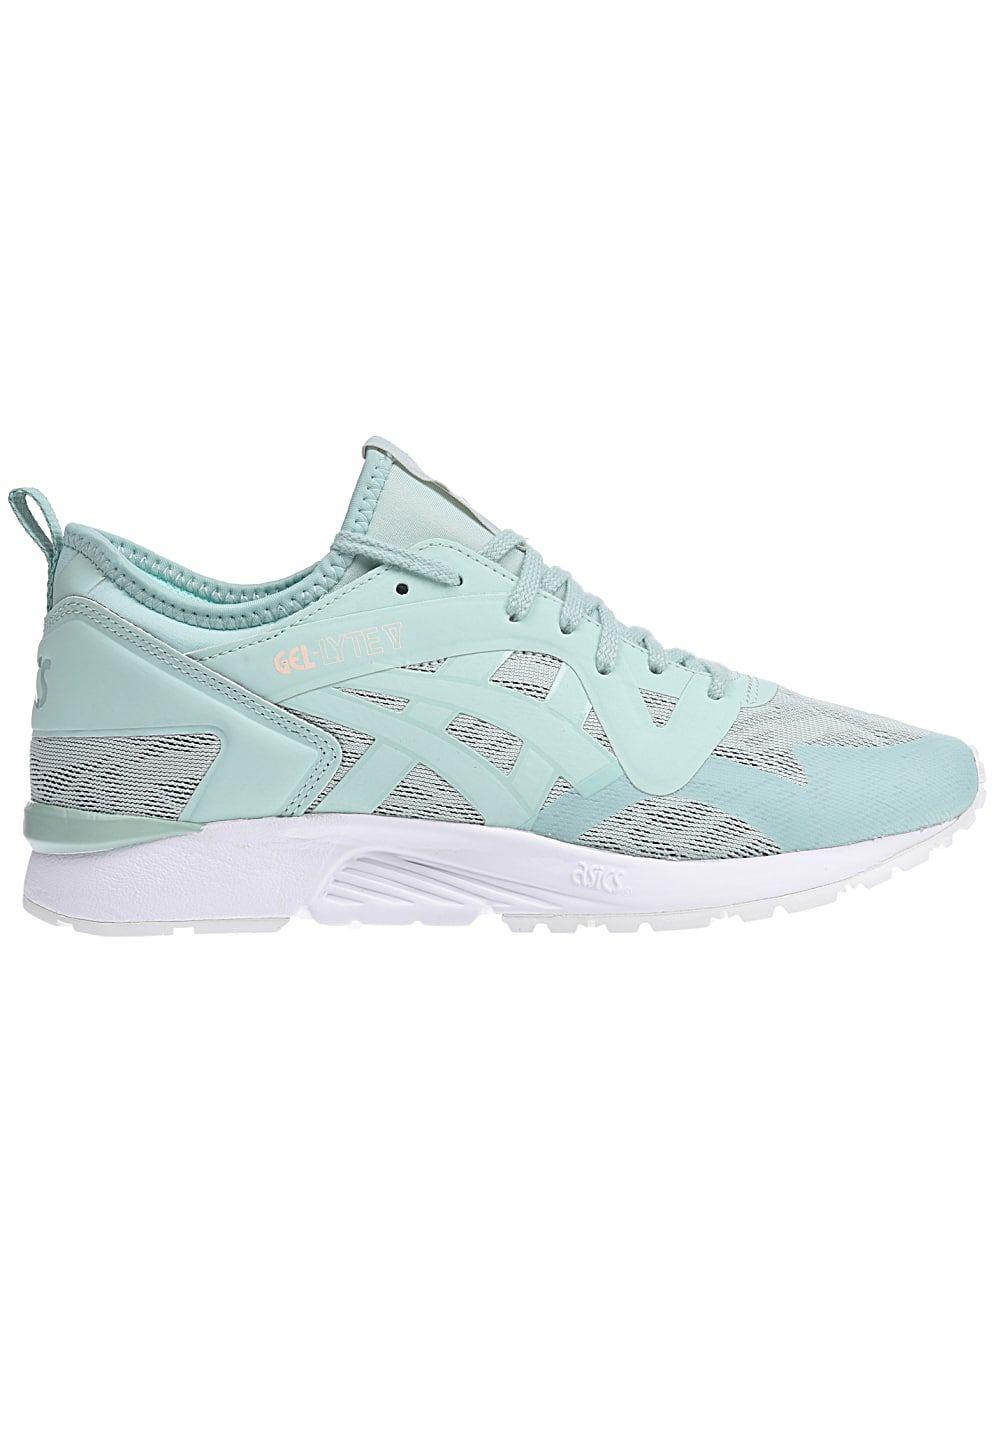 Asics Tiger Gel Lyte V NS Sneaker für Damen Grün #asics #sneakers ...